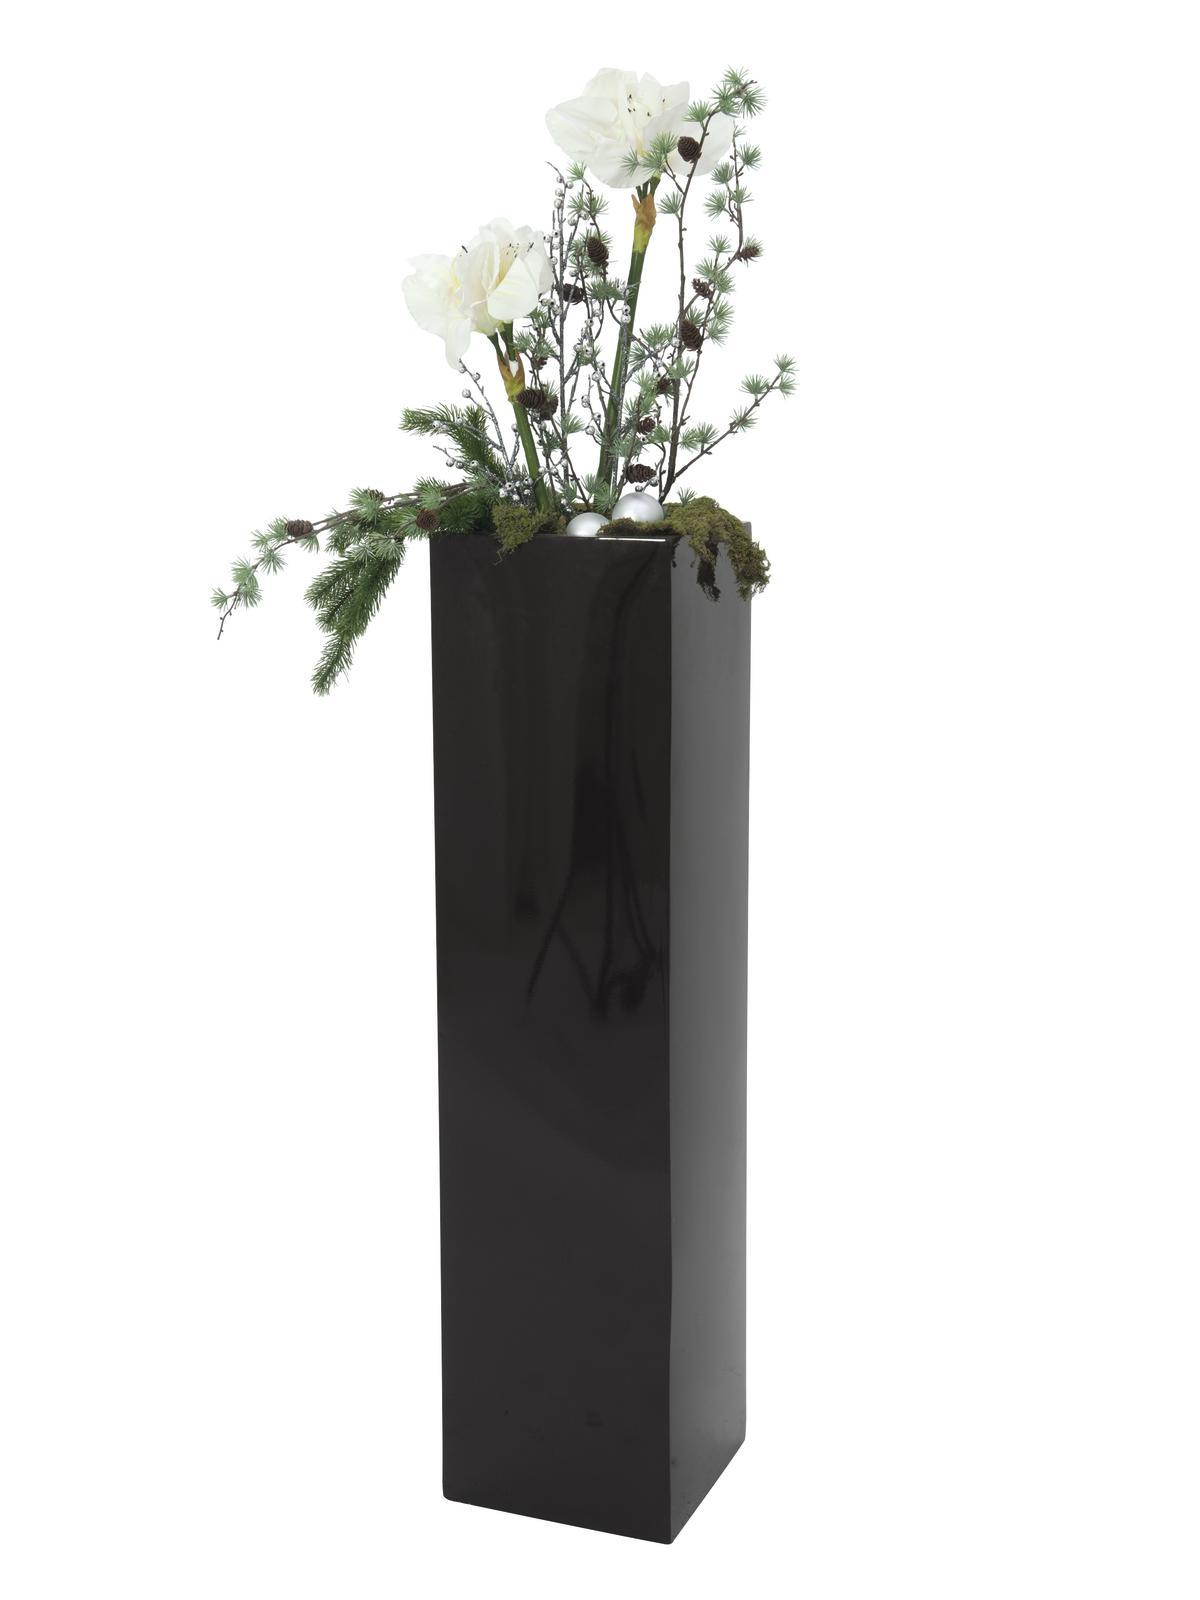 EUROPALMS Decoball 6cm, argento, metallizzato 6x